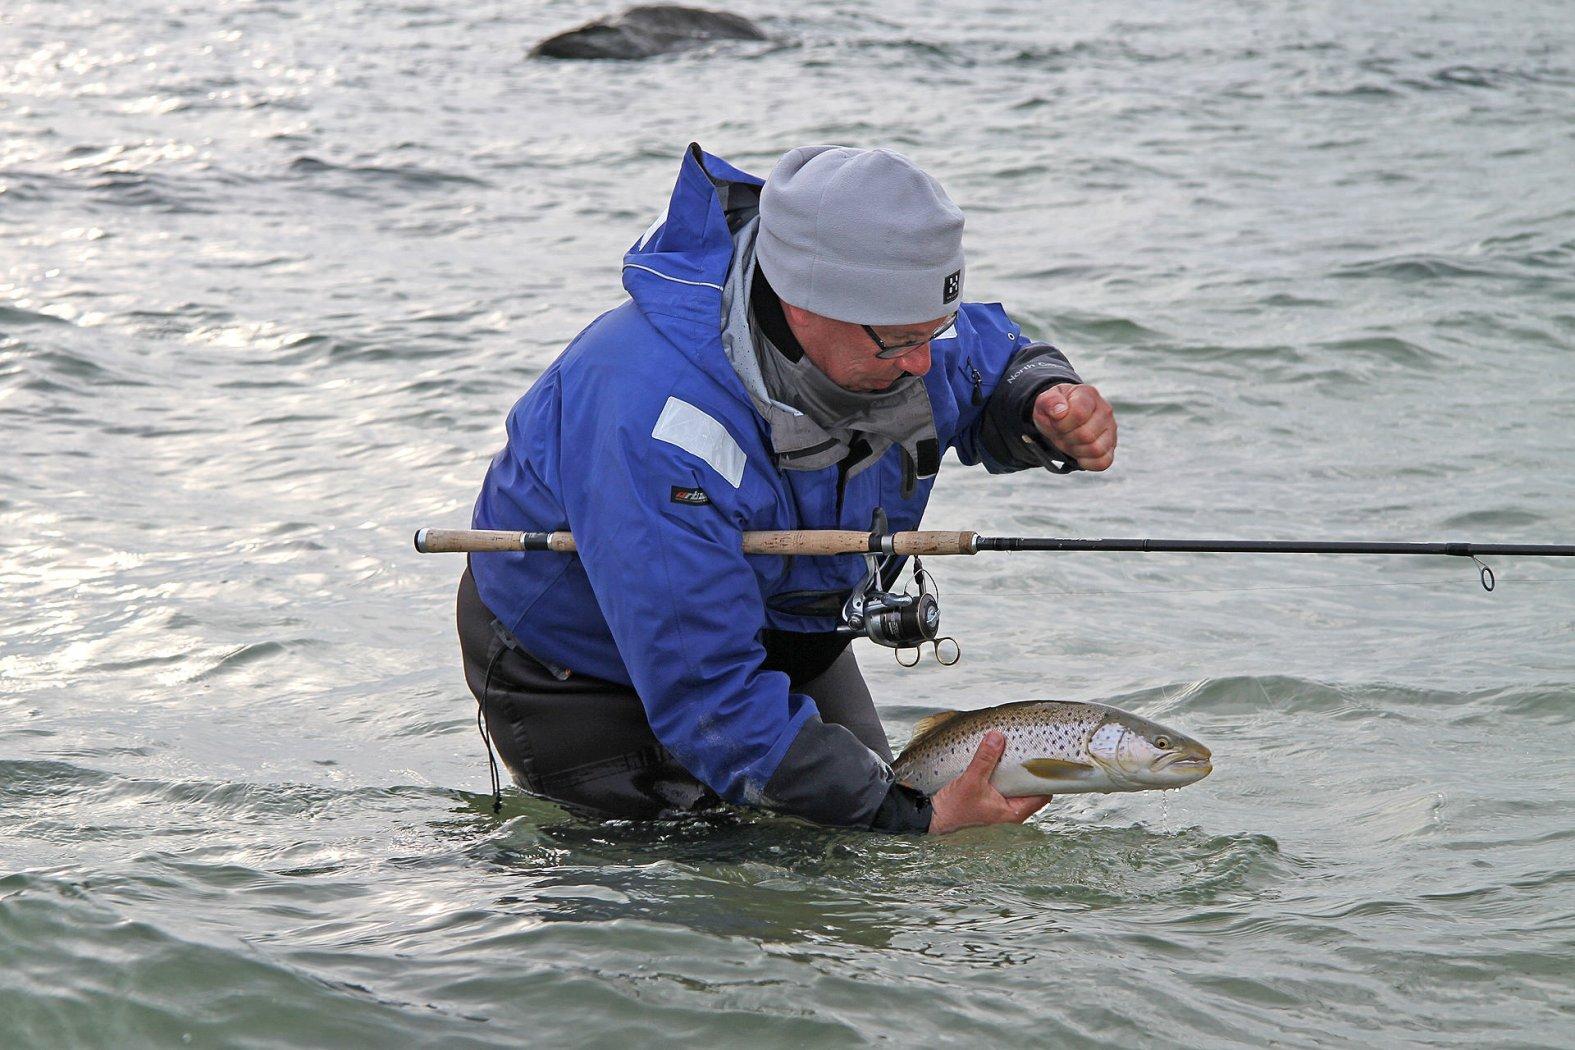 meerforellen fischen mit sbirolino